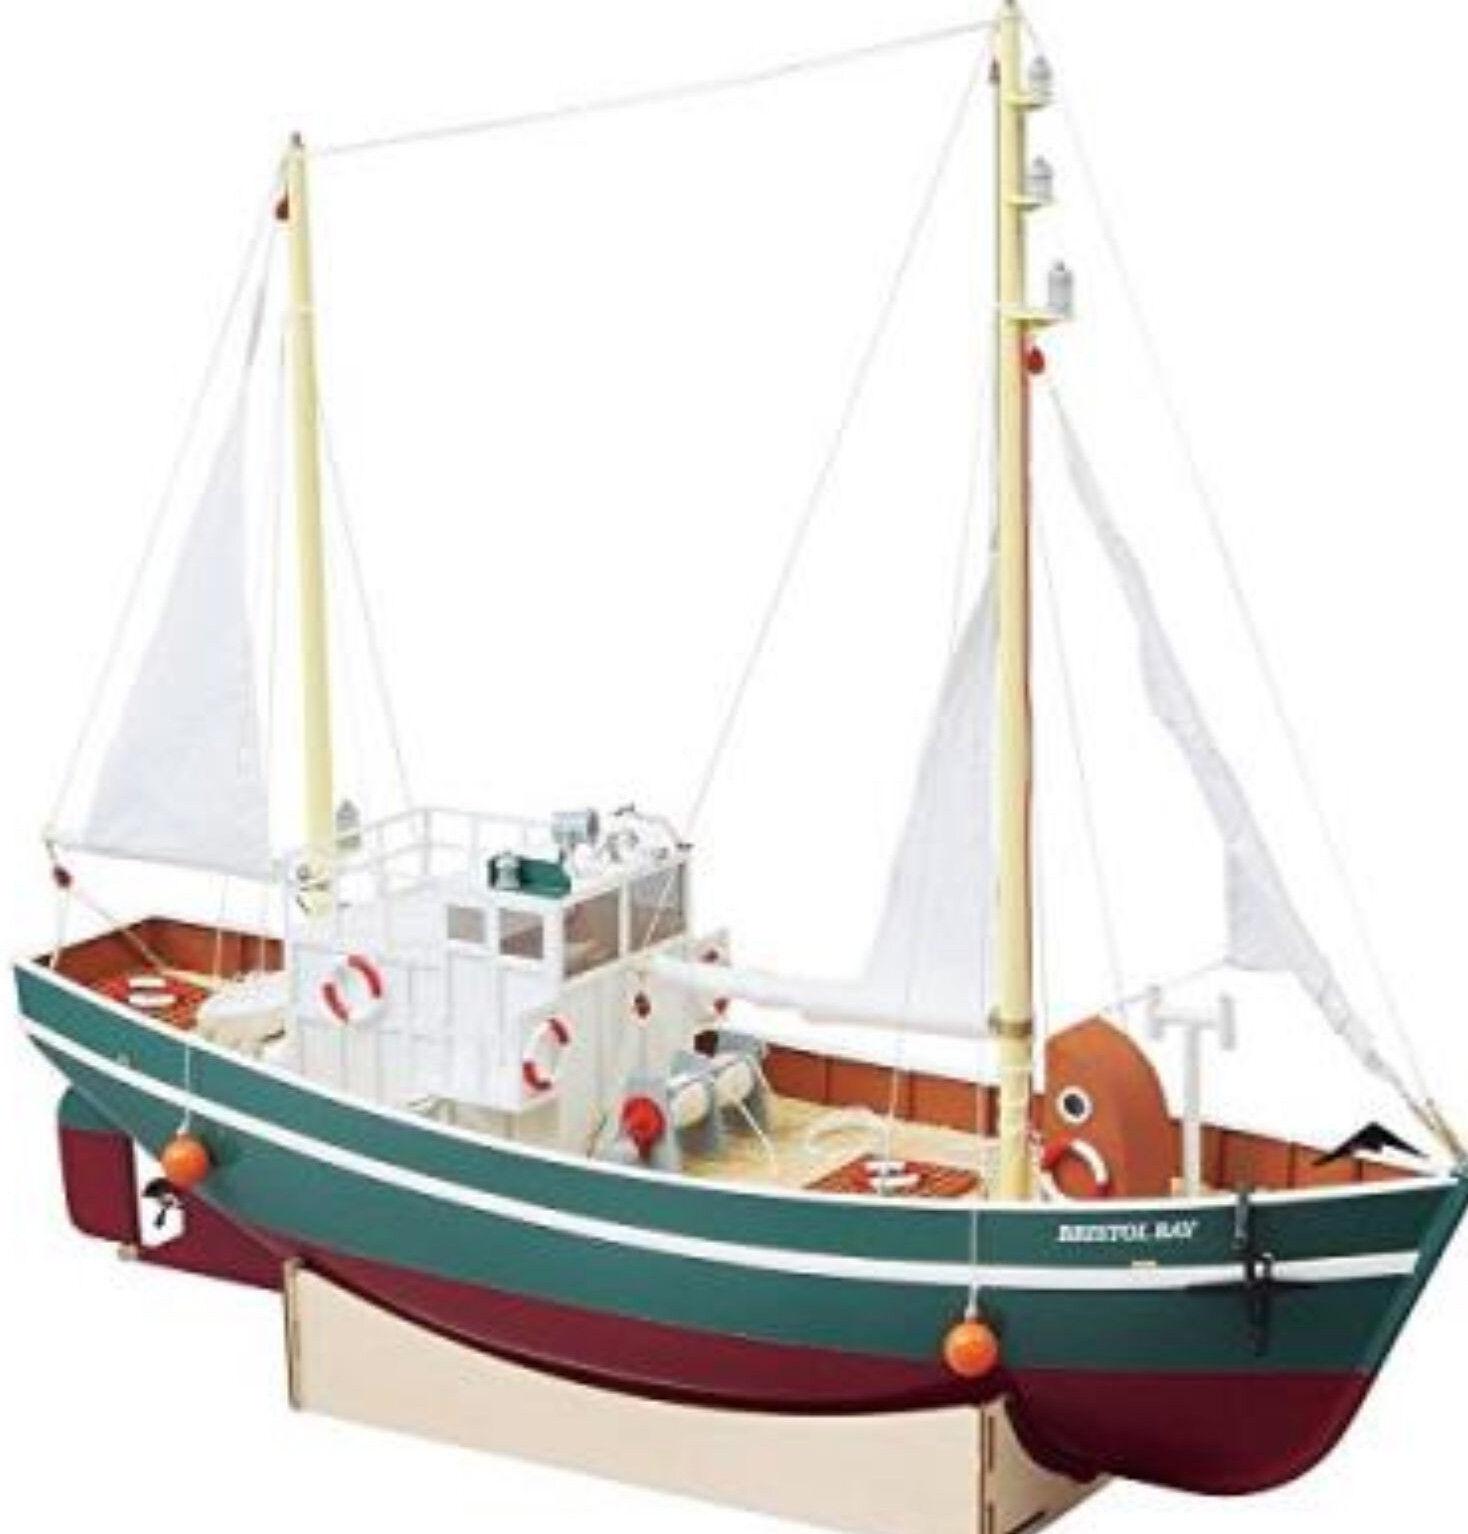 Aquacraft rtr fischcutter Bristol Bay arrastreros rtr Aquacraft aqub 5721 76fd2f